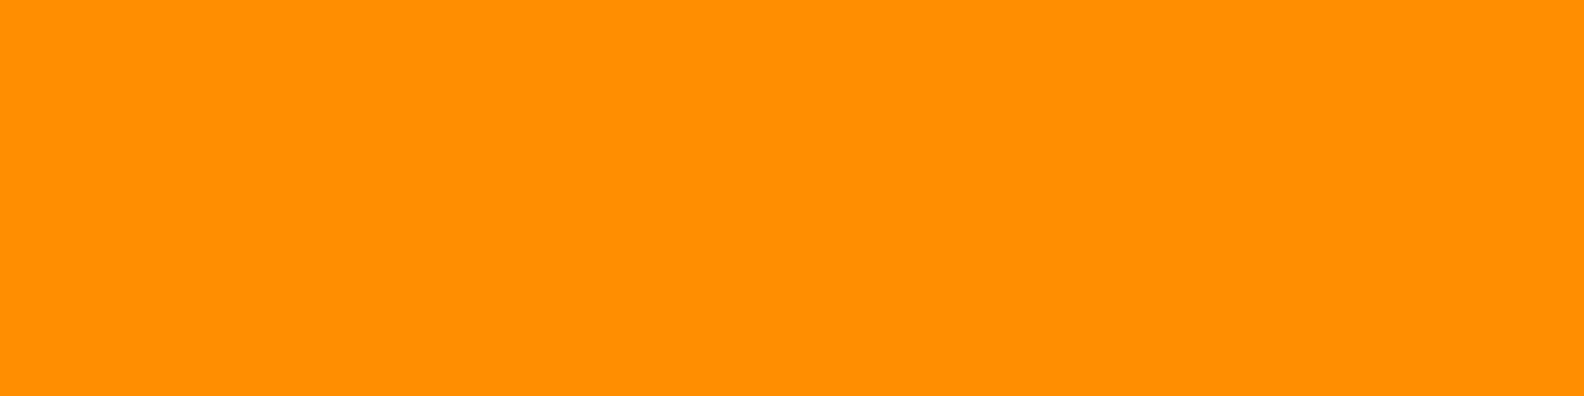 1584x396 Princeton Orange Solid Color Background